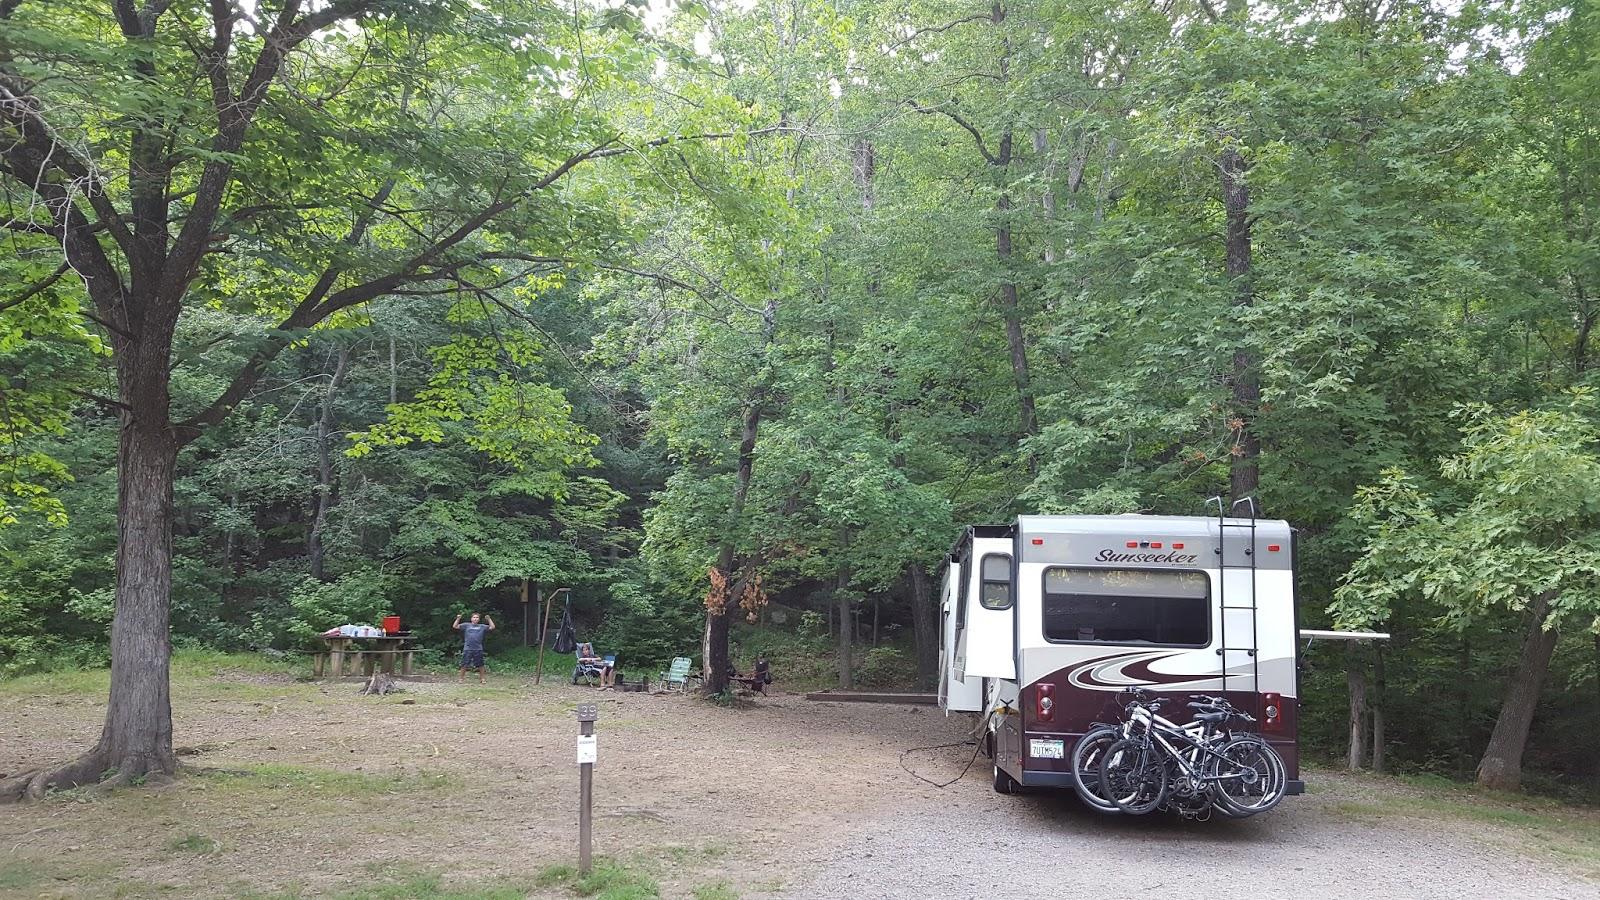 Campgroundcrazy